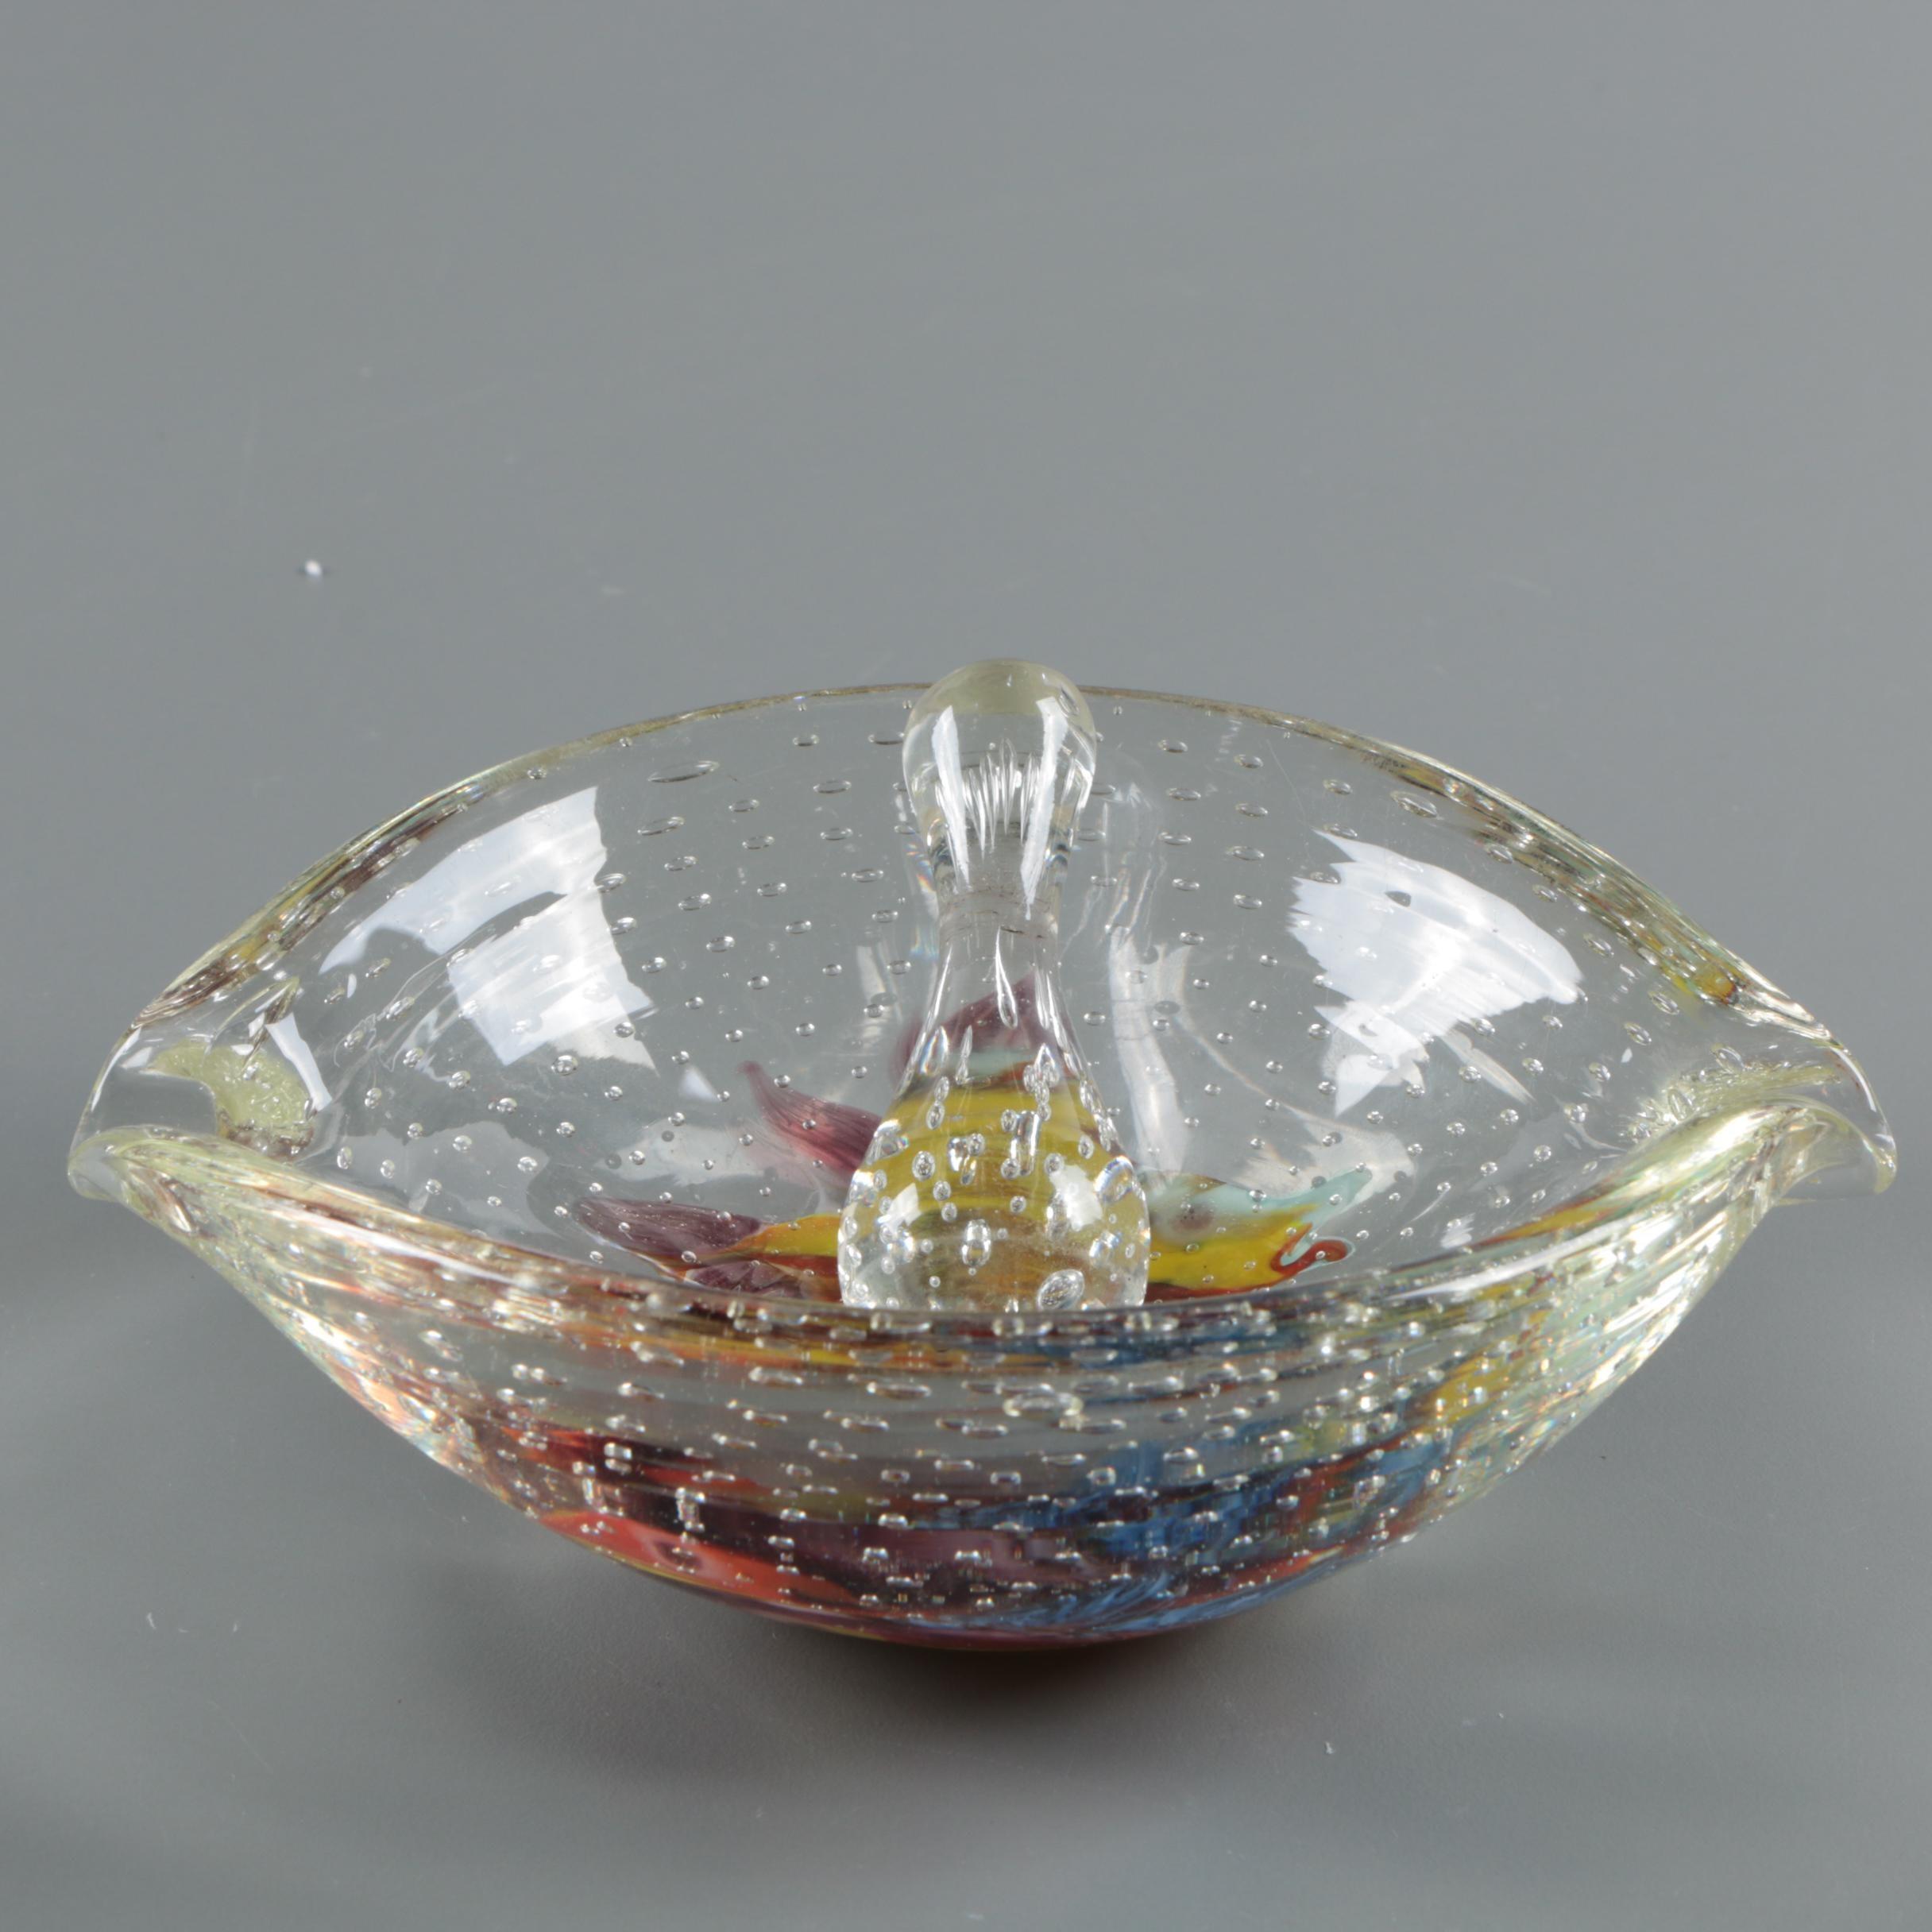 Murano Style Art Glass Mortar and Pestle